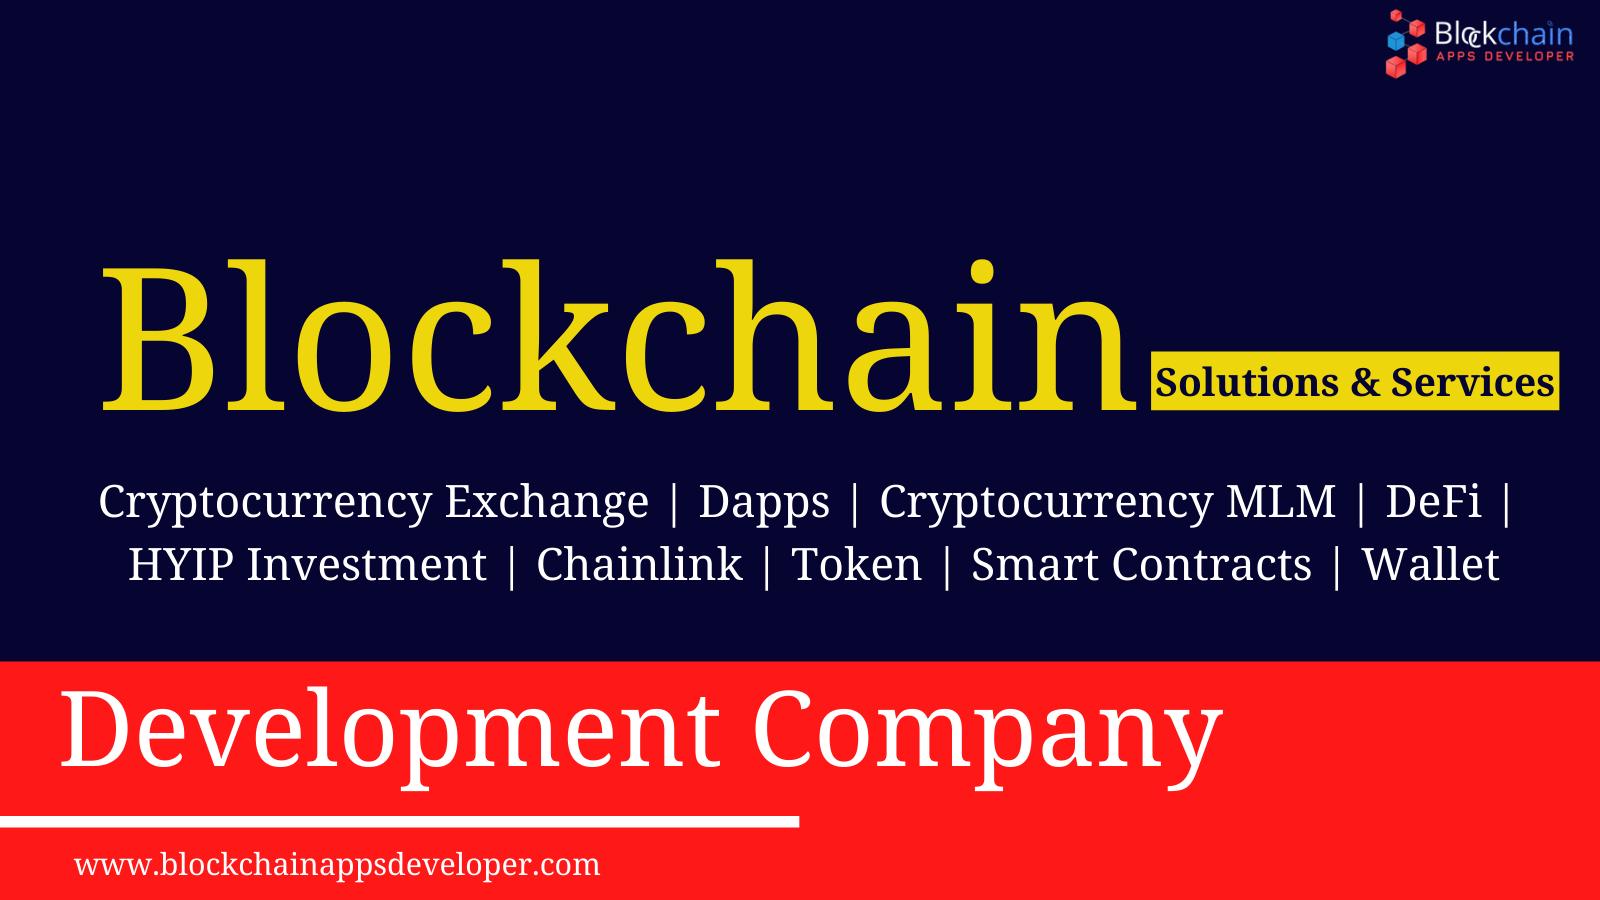 Blockchain Development Company | Blockchain Application Development Services